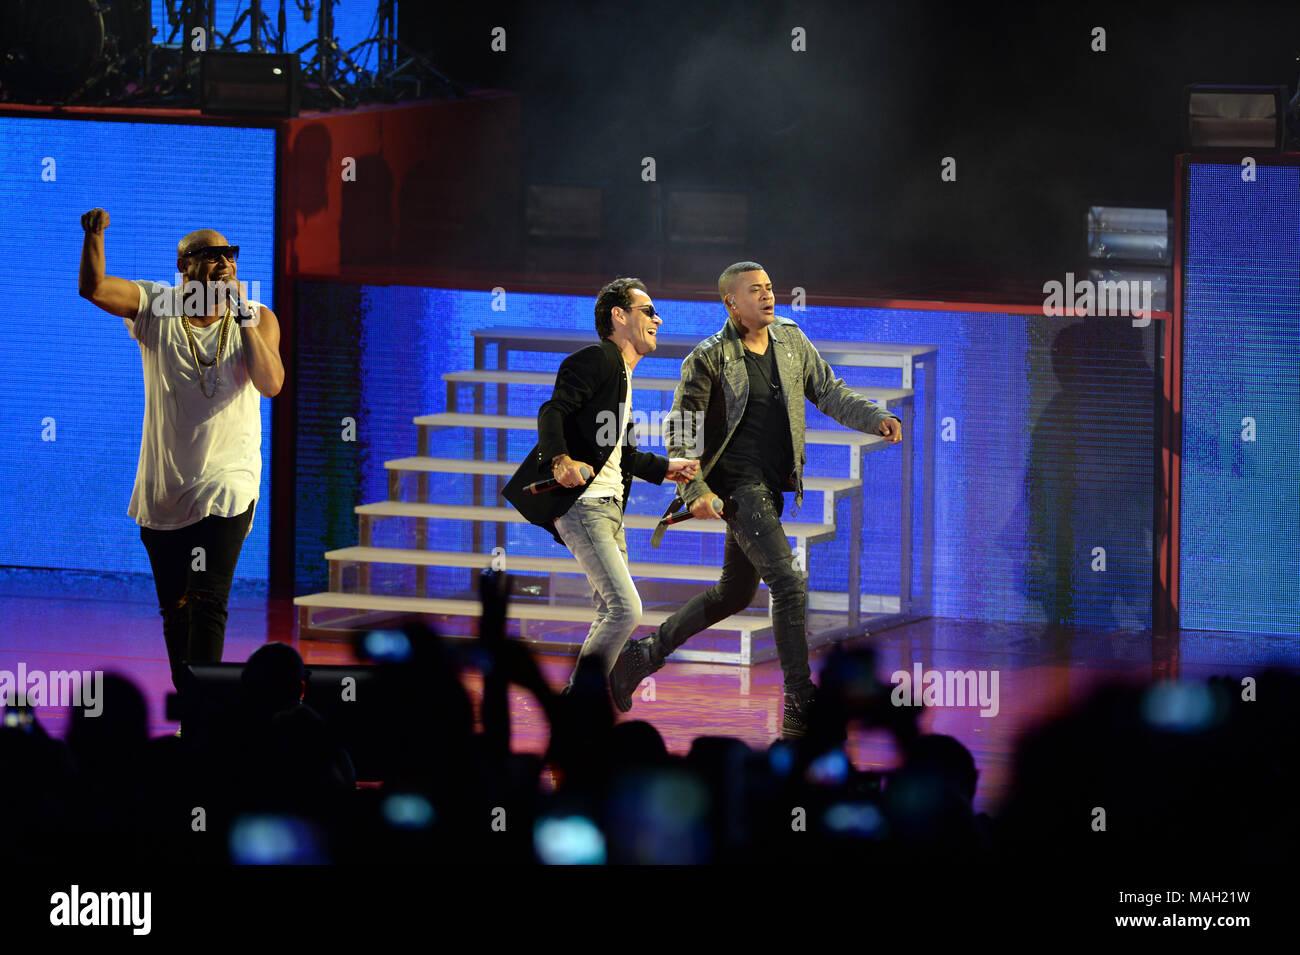 Jennifer Lopez Marc Anthony Perform Stock Photos & Jennifer